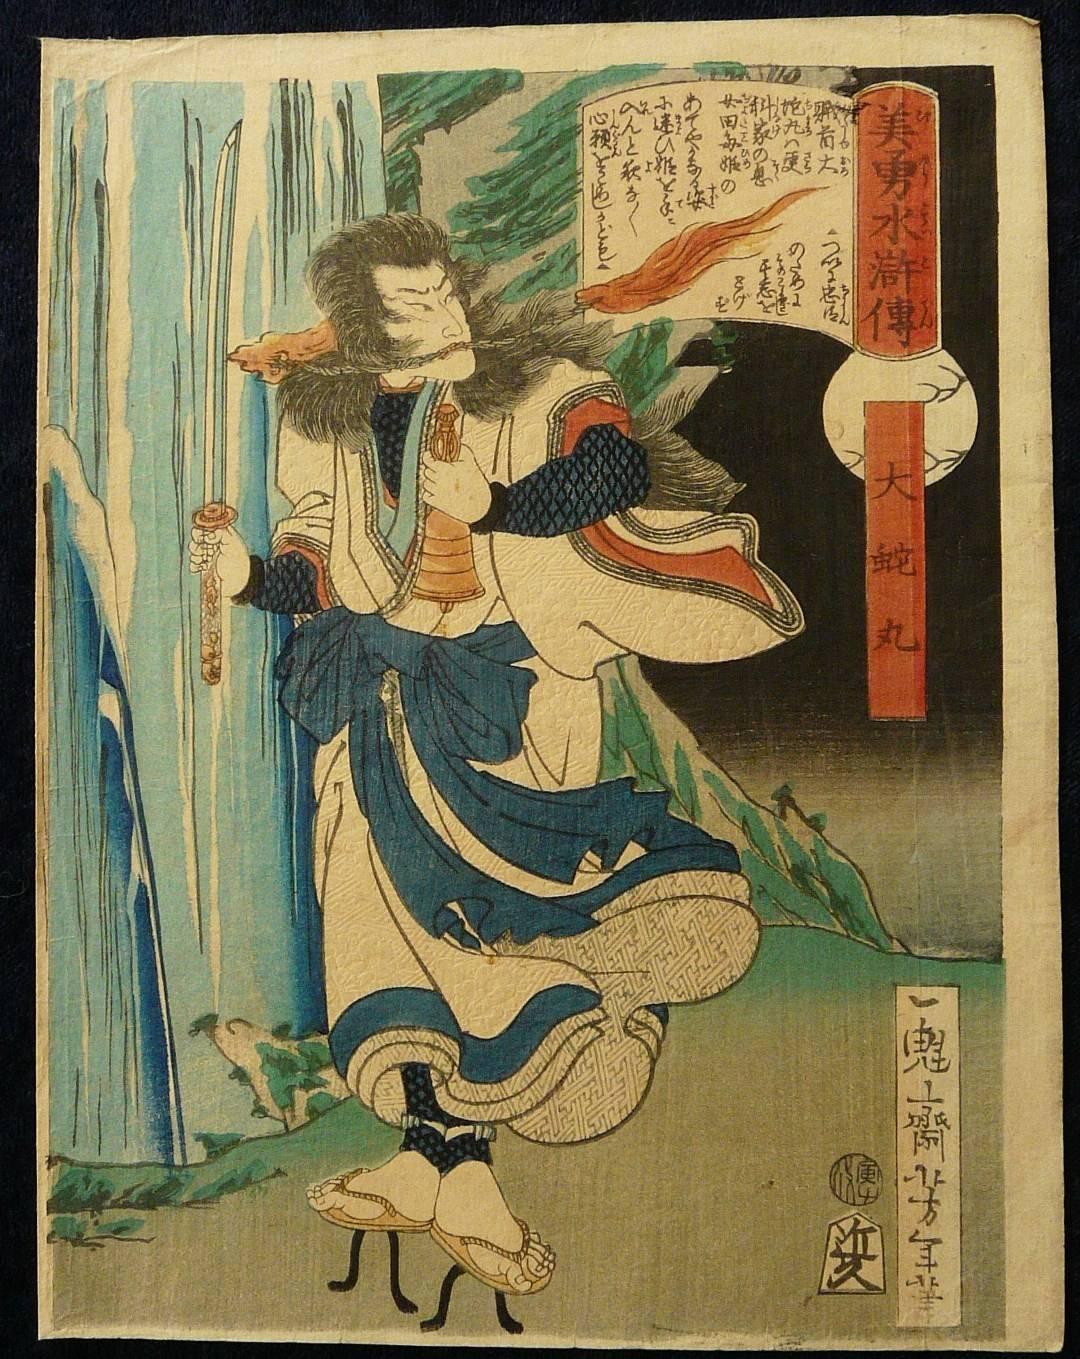 TAISO YOSHITOSHI: #P3969 BESIDE A WATERFALL WHILE THE FULL MOON SHINES, No 9 IN THE SERIES BIYU SUIKODEN